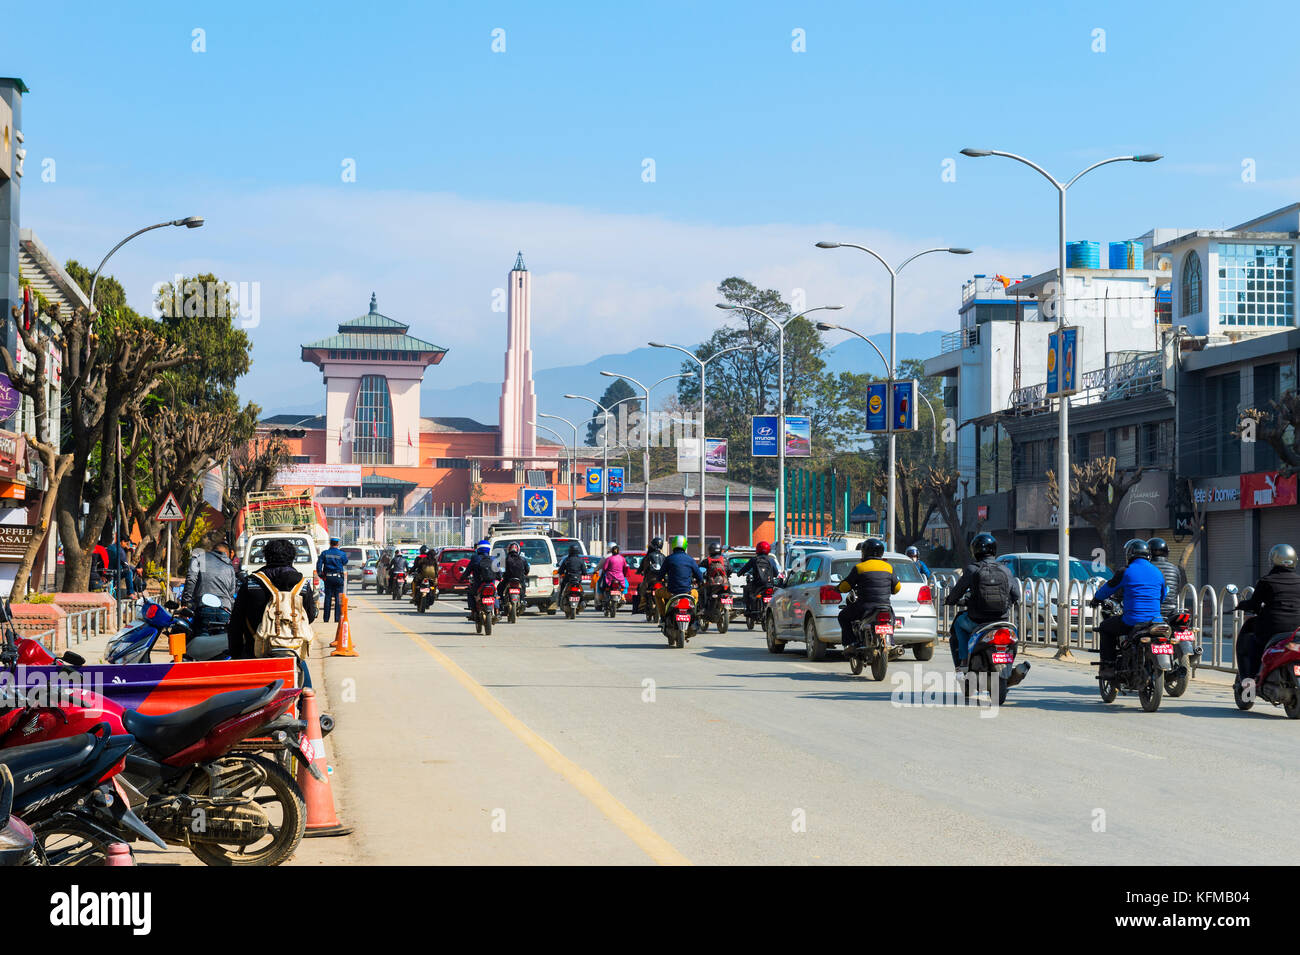 Durbar Marg Avenue e Narayanhiti Palace o il nuovo Palazzo Reale, Kathmandu, Nepal Immagini Stock